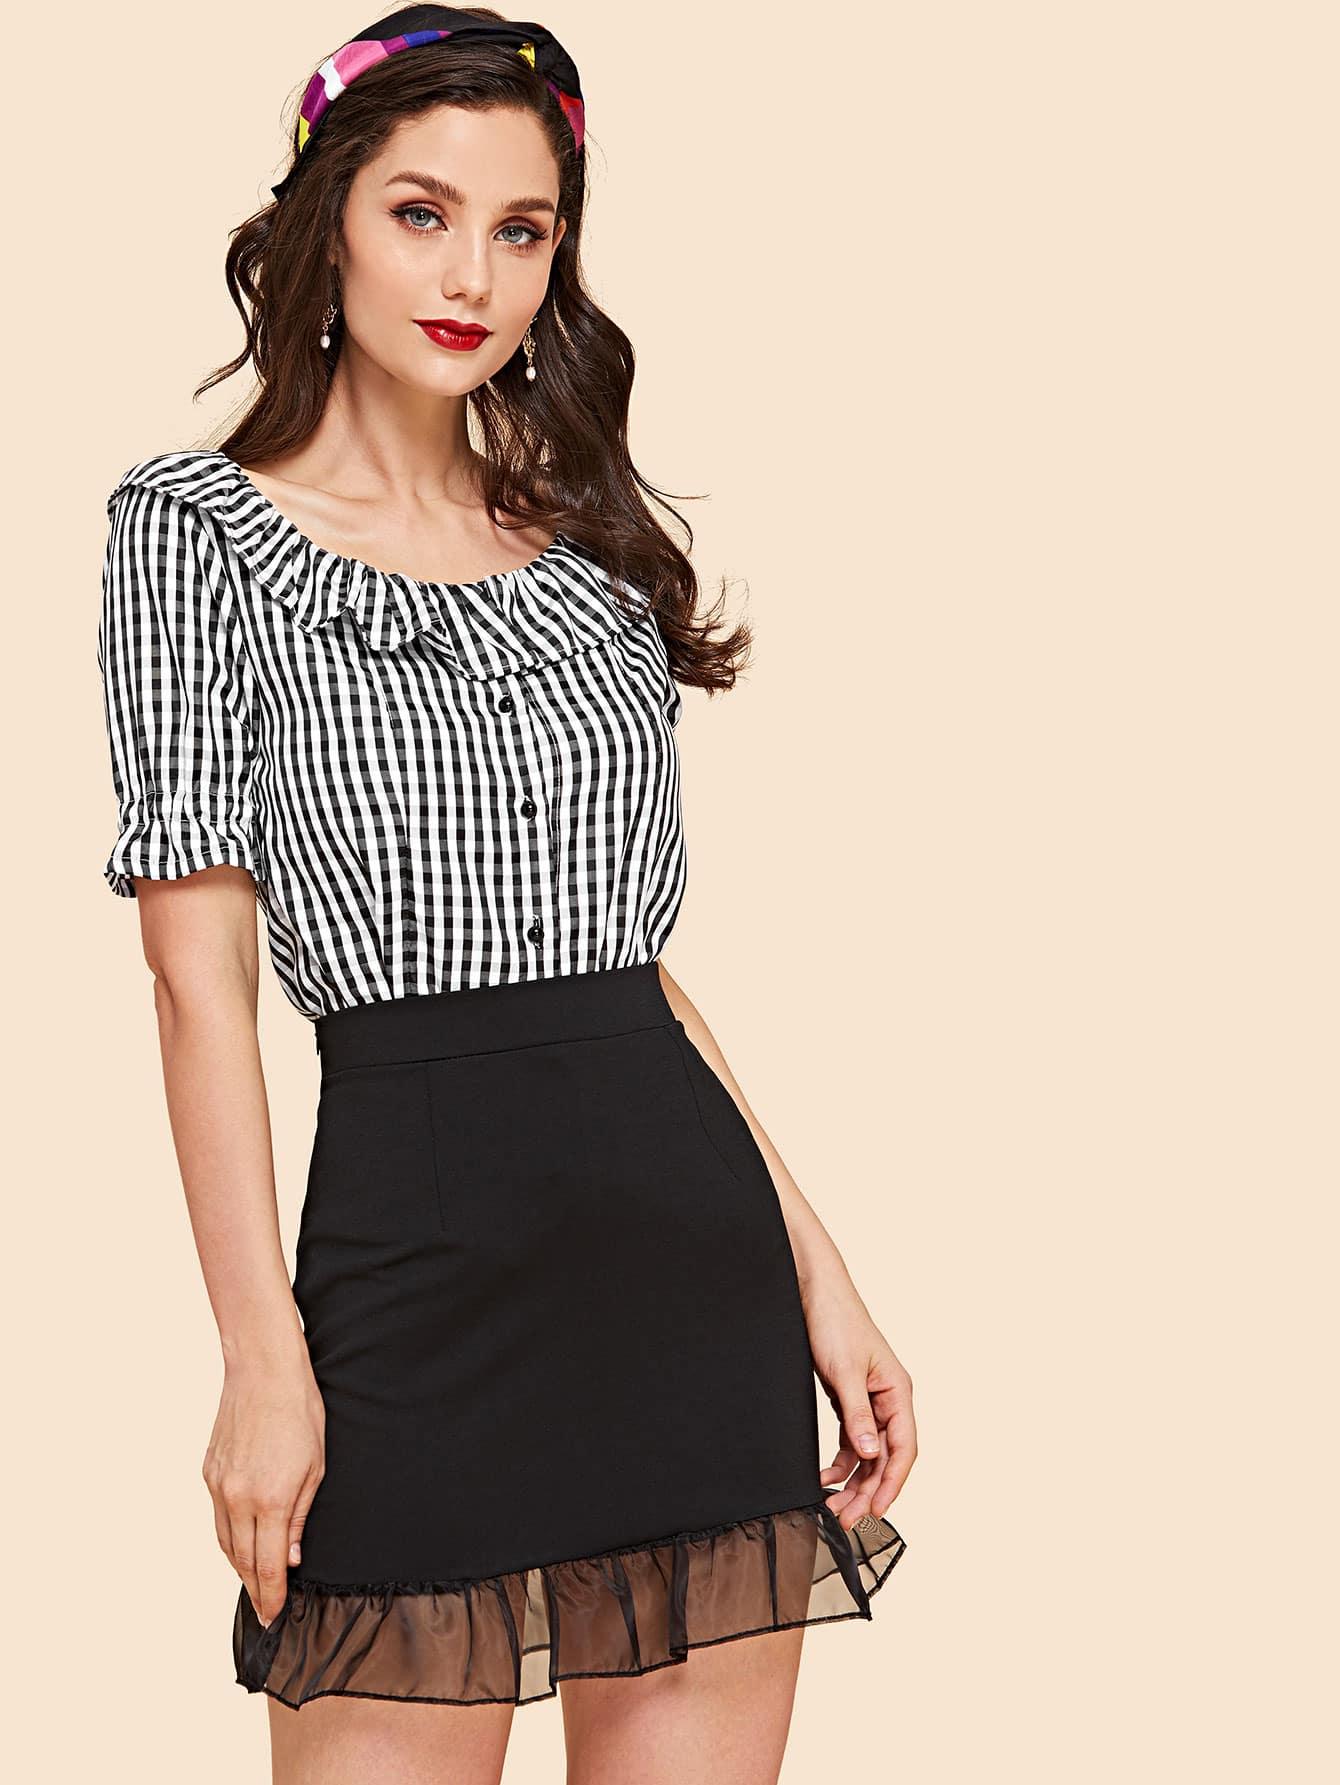 Ruffle Neck Plaid Top & Mesh Contrast Skirt